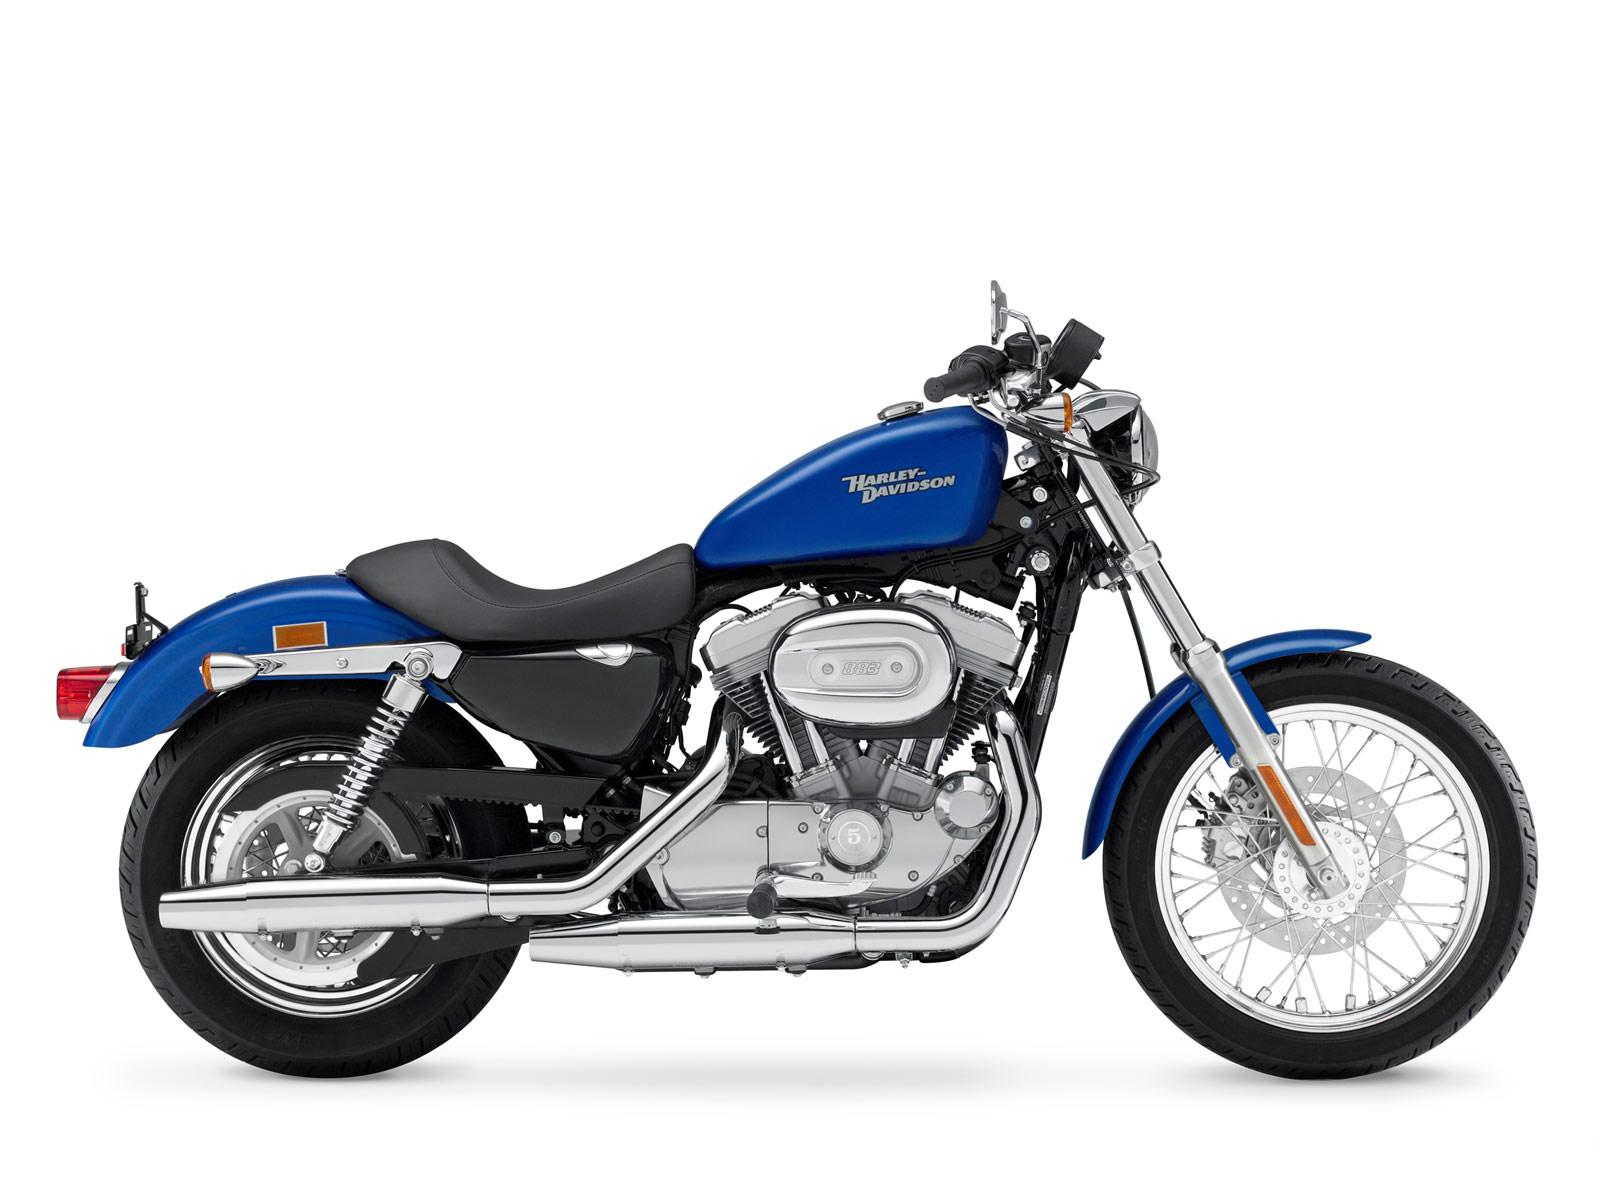 Harley Davidson: 2008 Harley-Davidson XL883 Sportster 883 Accident Lawyers Info